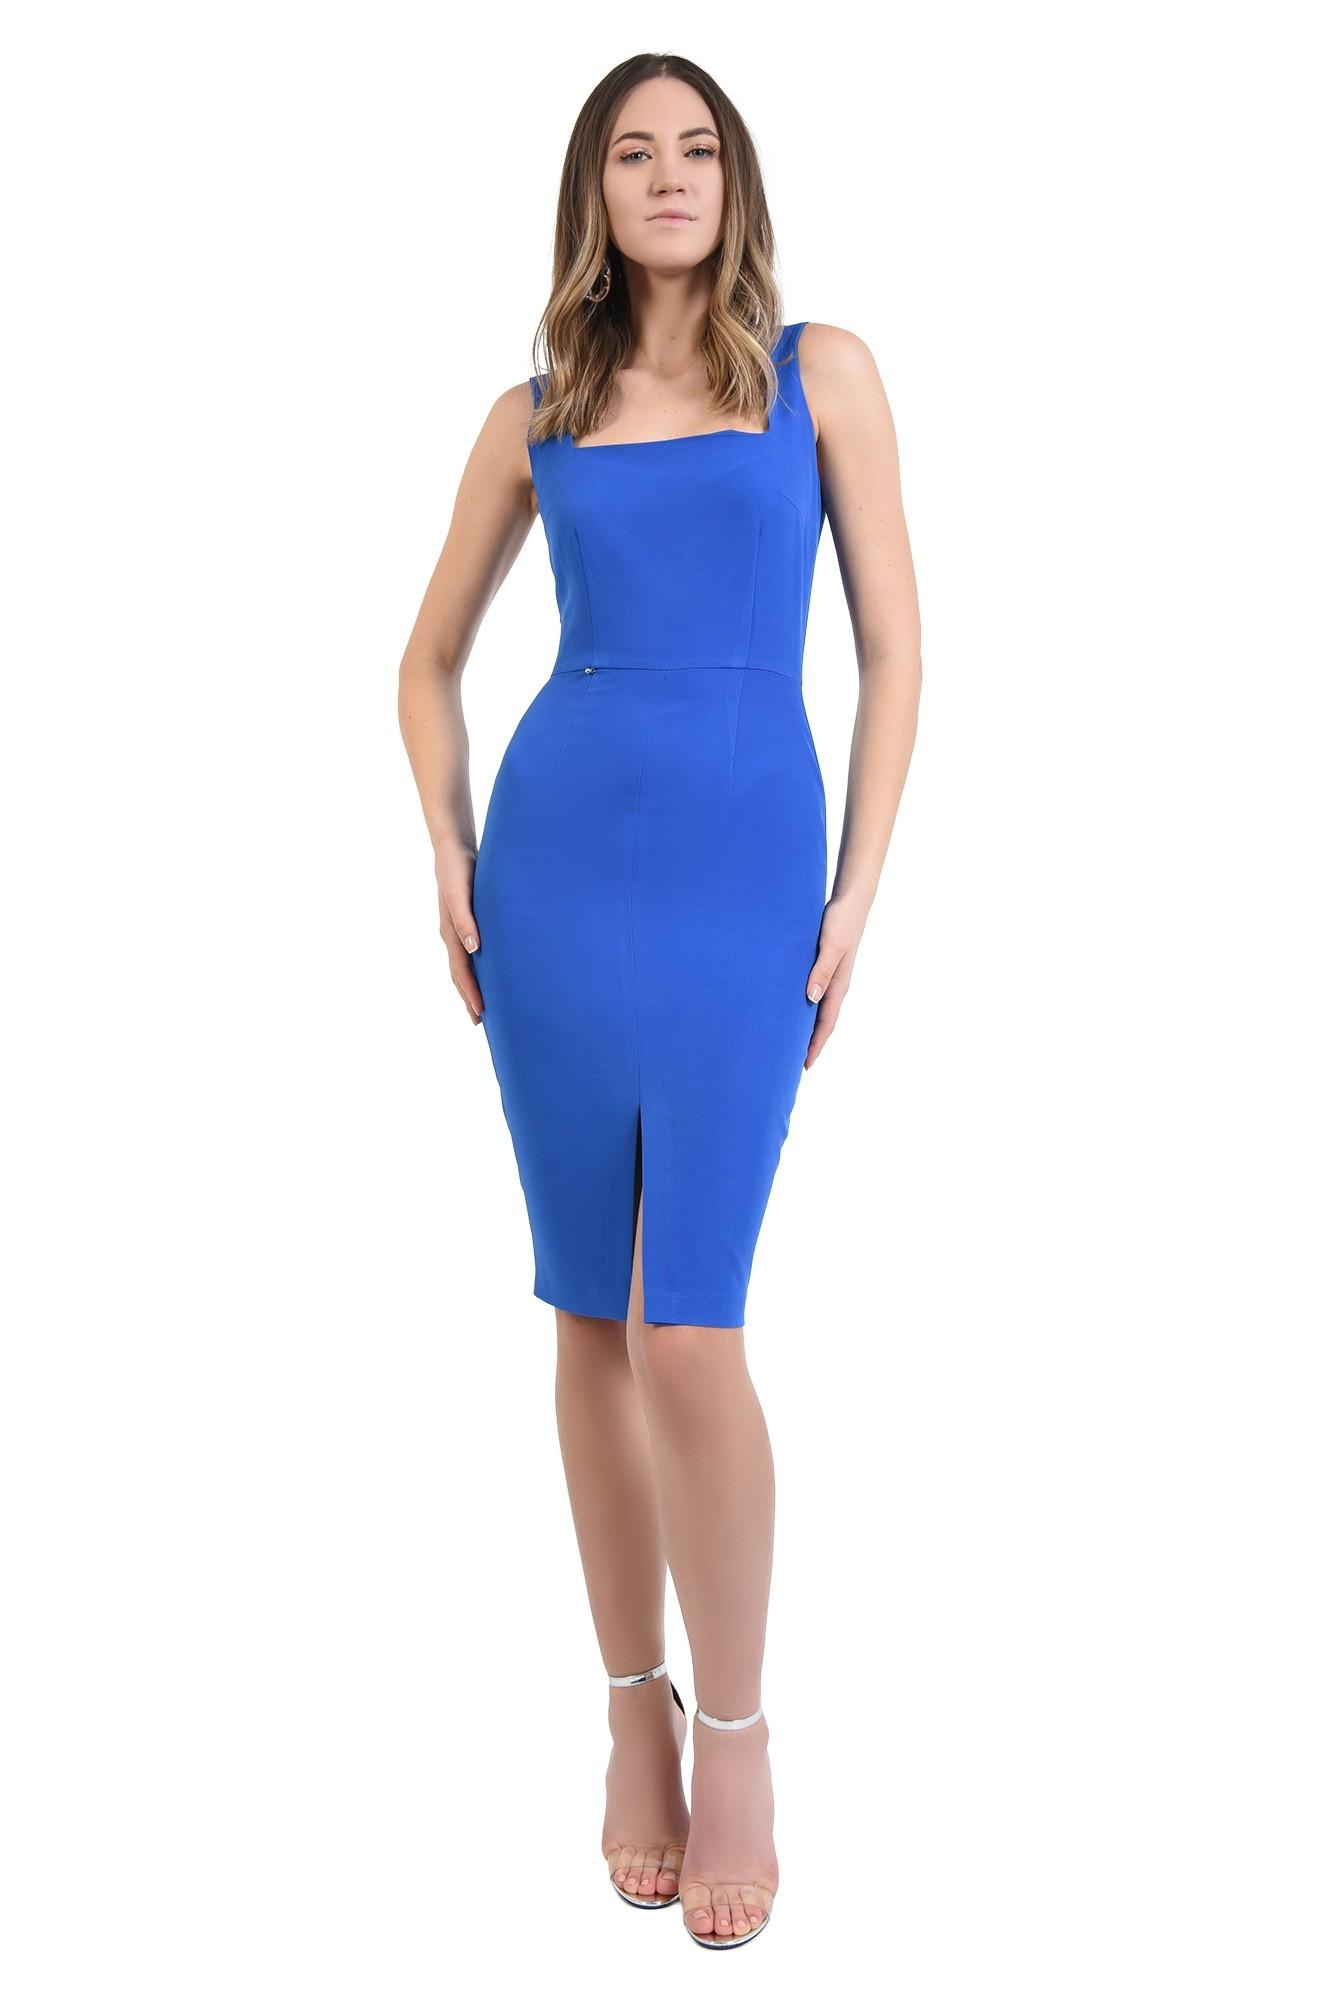 3 - 360 - rochie albastra, cu bretele, de ocazie, cu decolteu